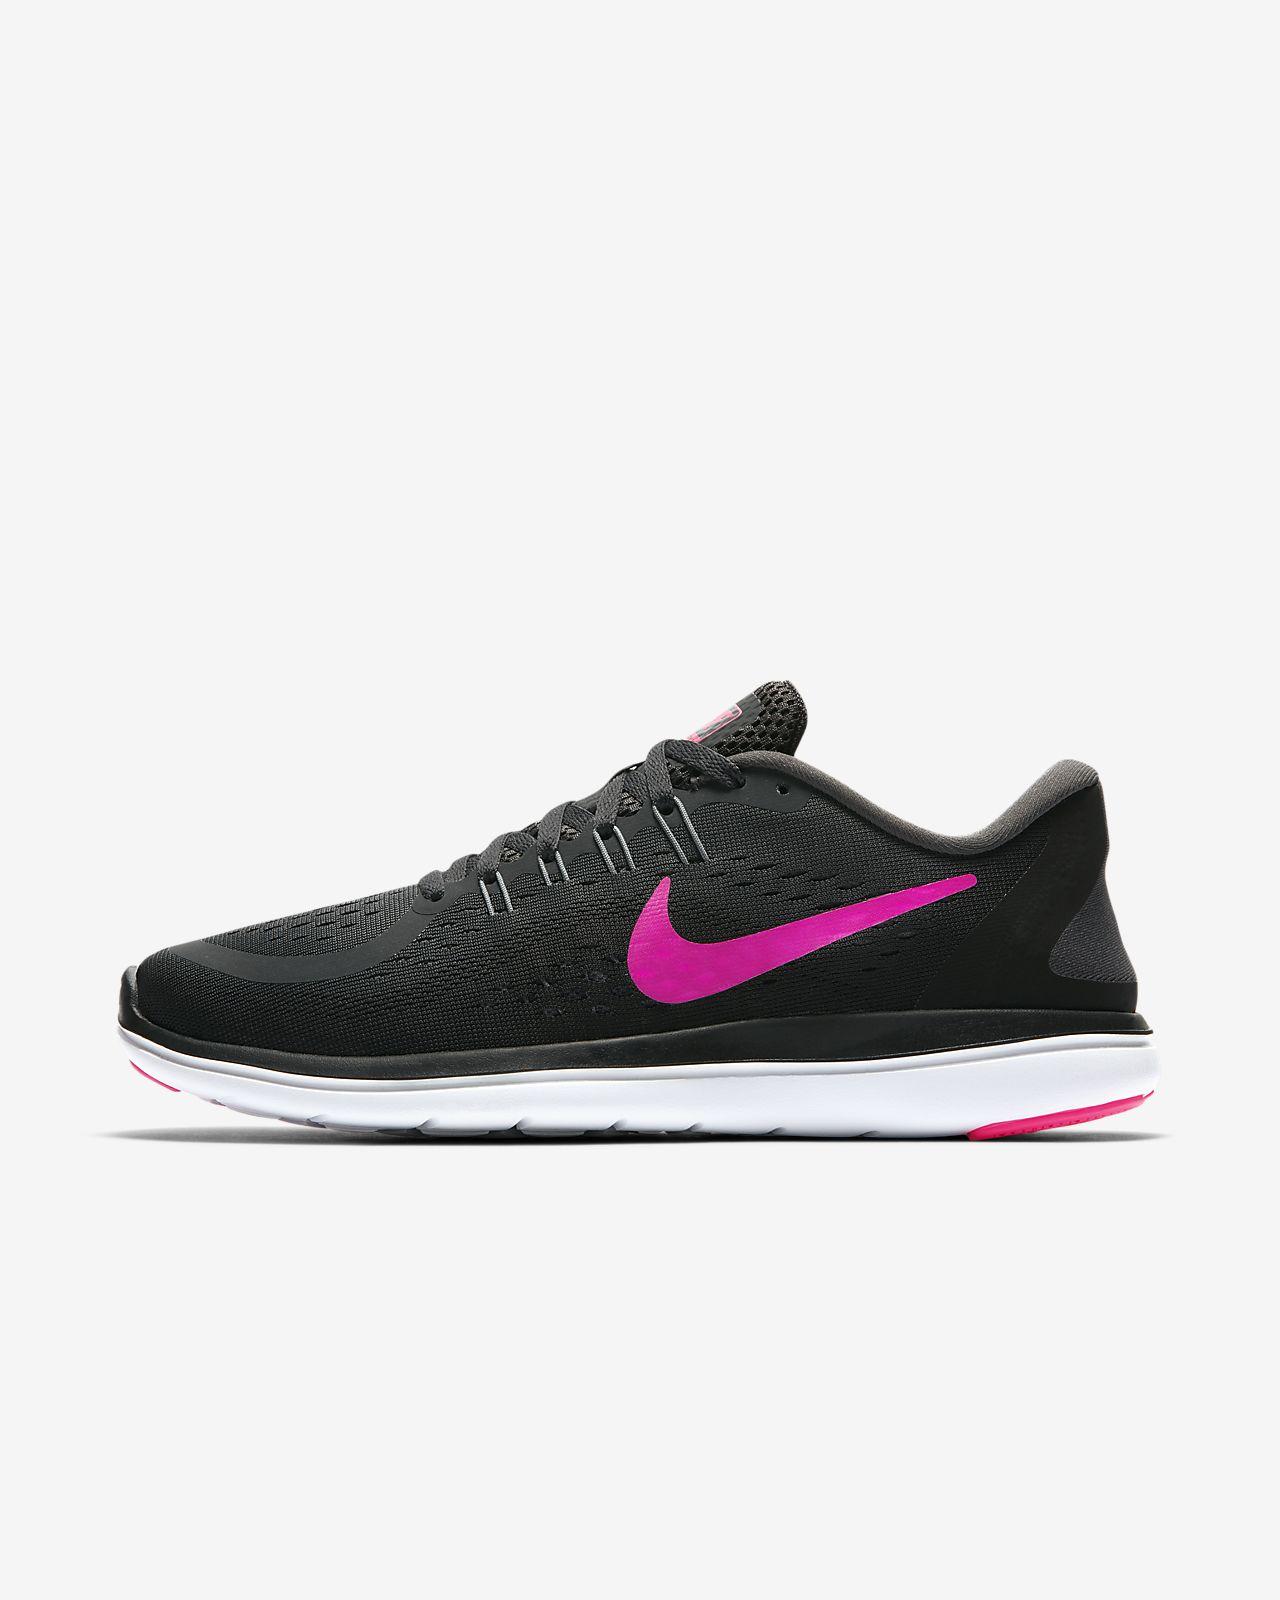 Nike FLEX 2017 Run Running Sport da Palestra Casual Fitness Sneaker UK 7 12